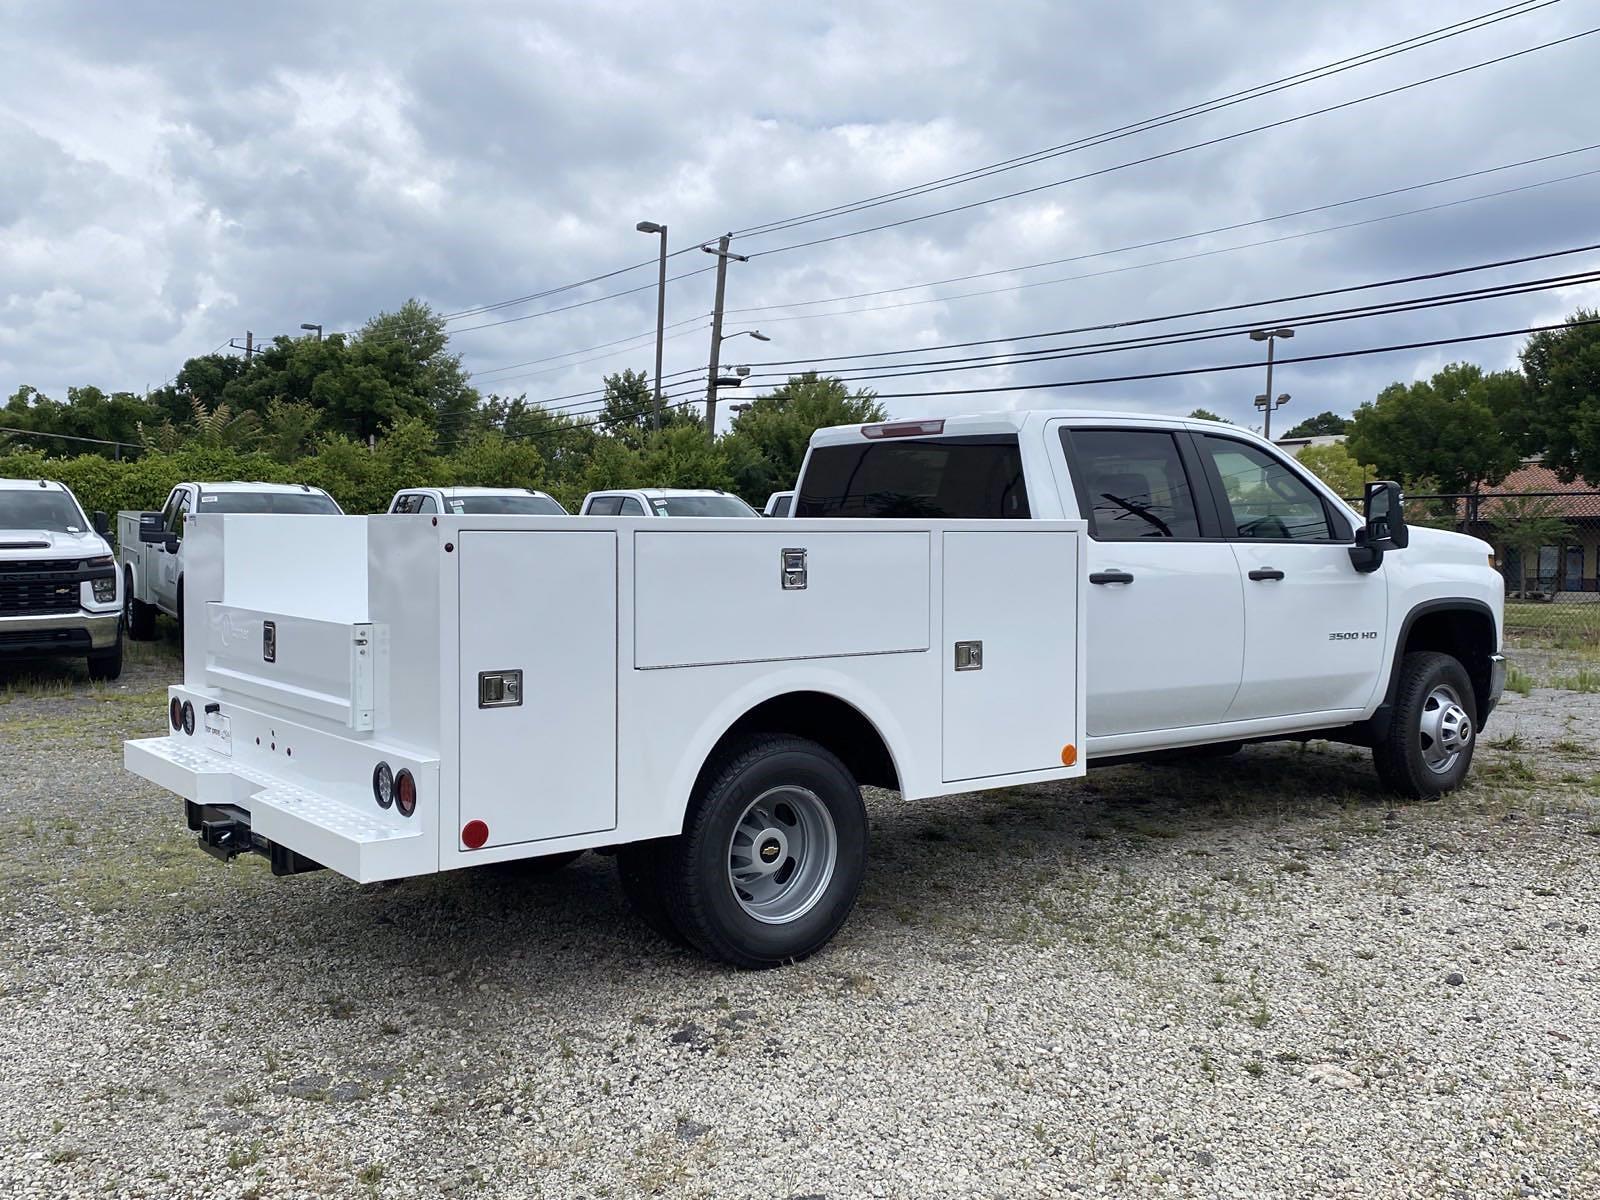 2021 Silverado 3500 Crew Cab 4x2,  Warner Truck Bodies Service Body #351028 - photo 4